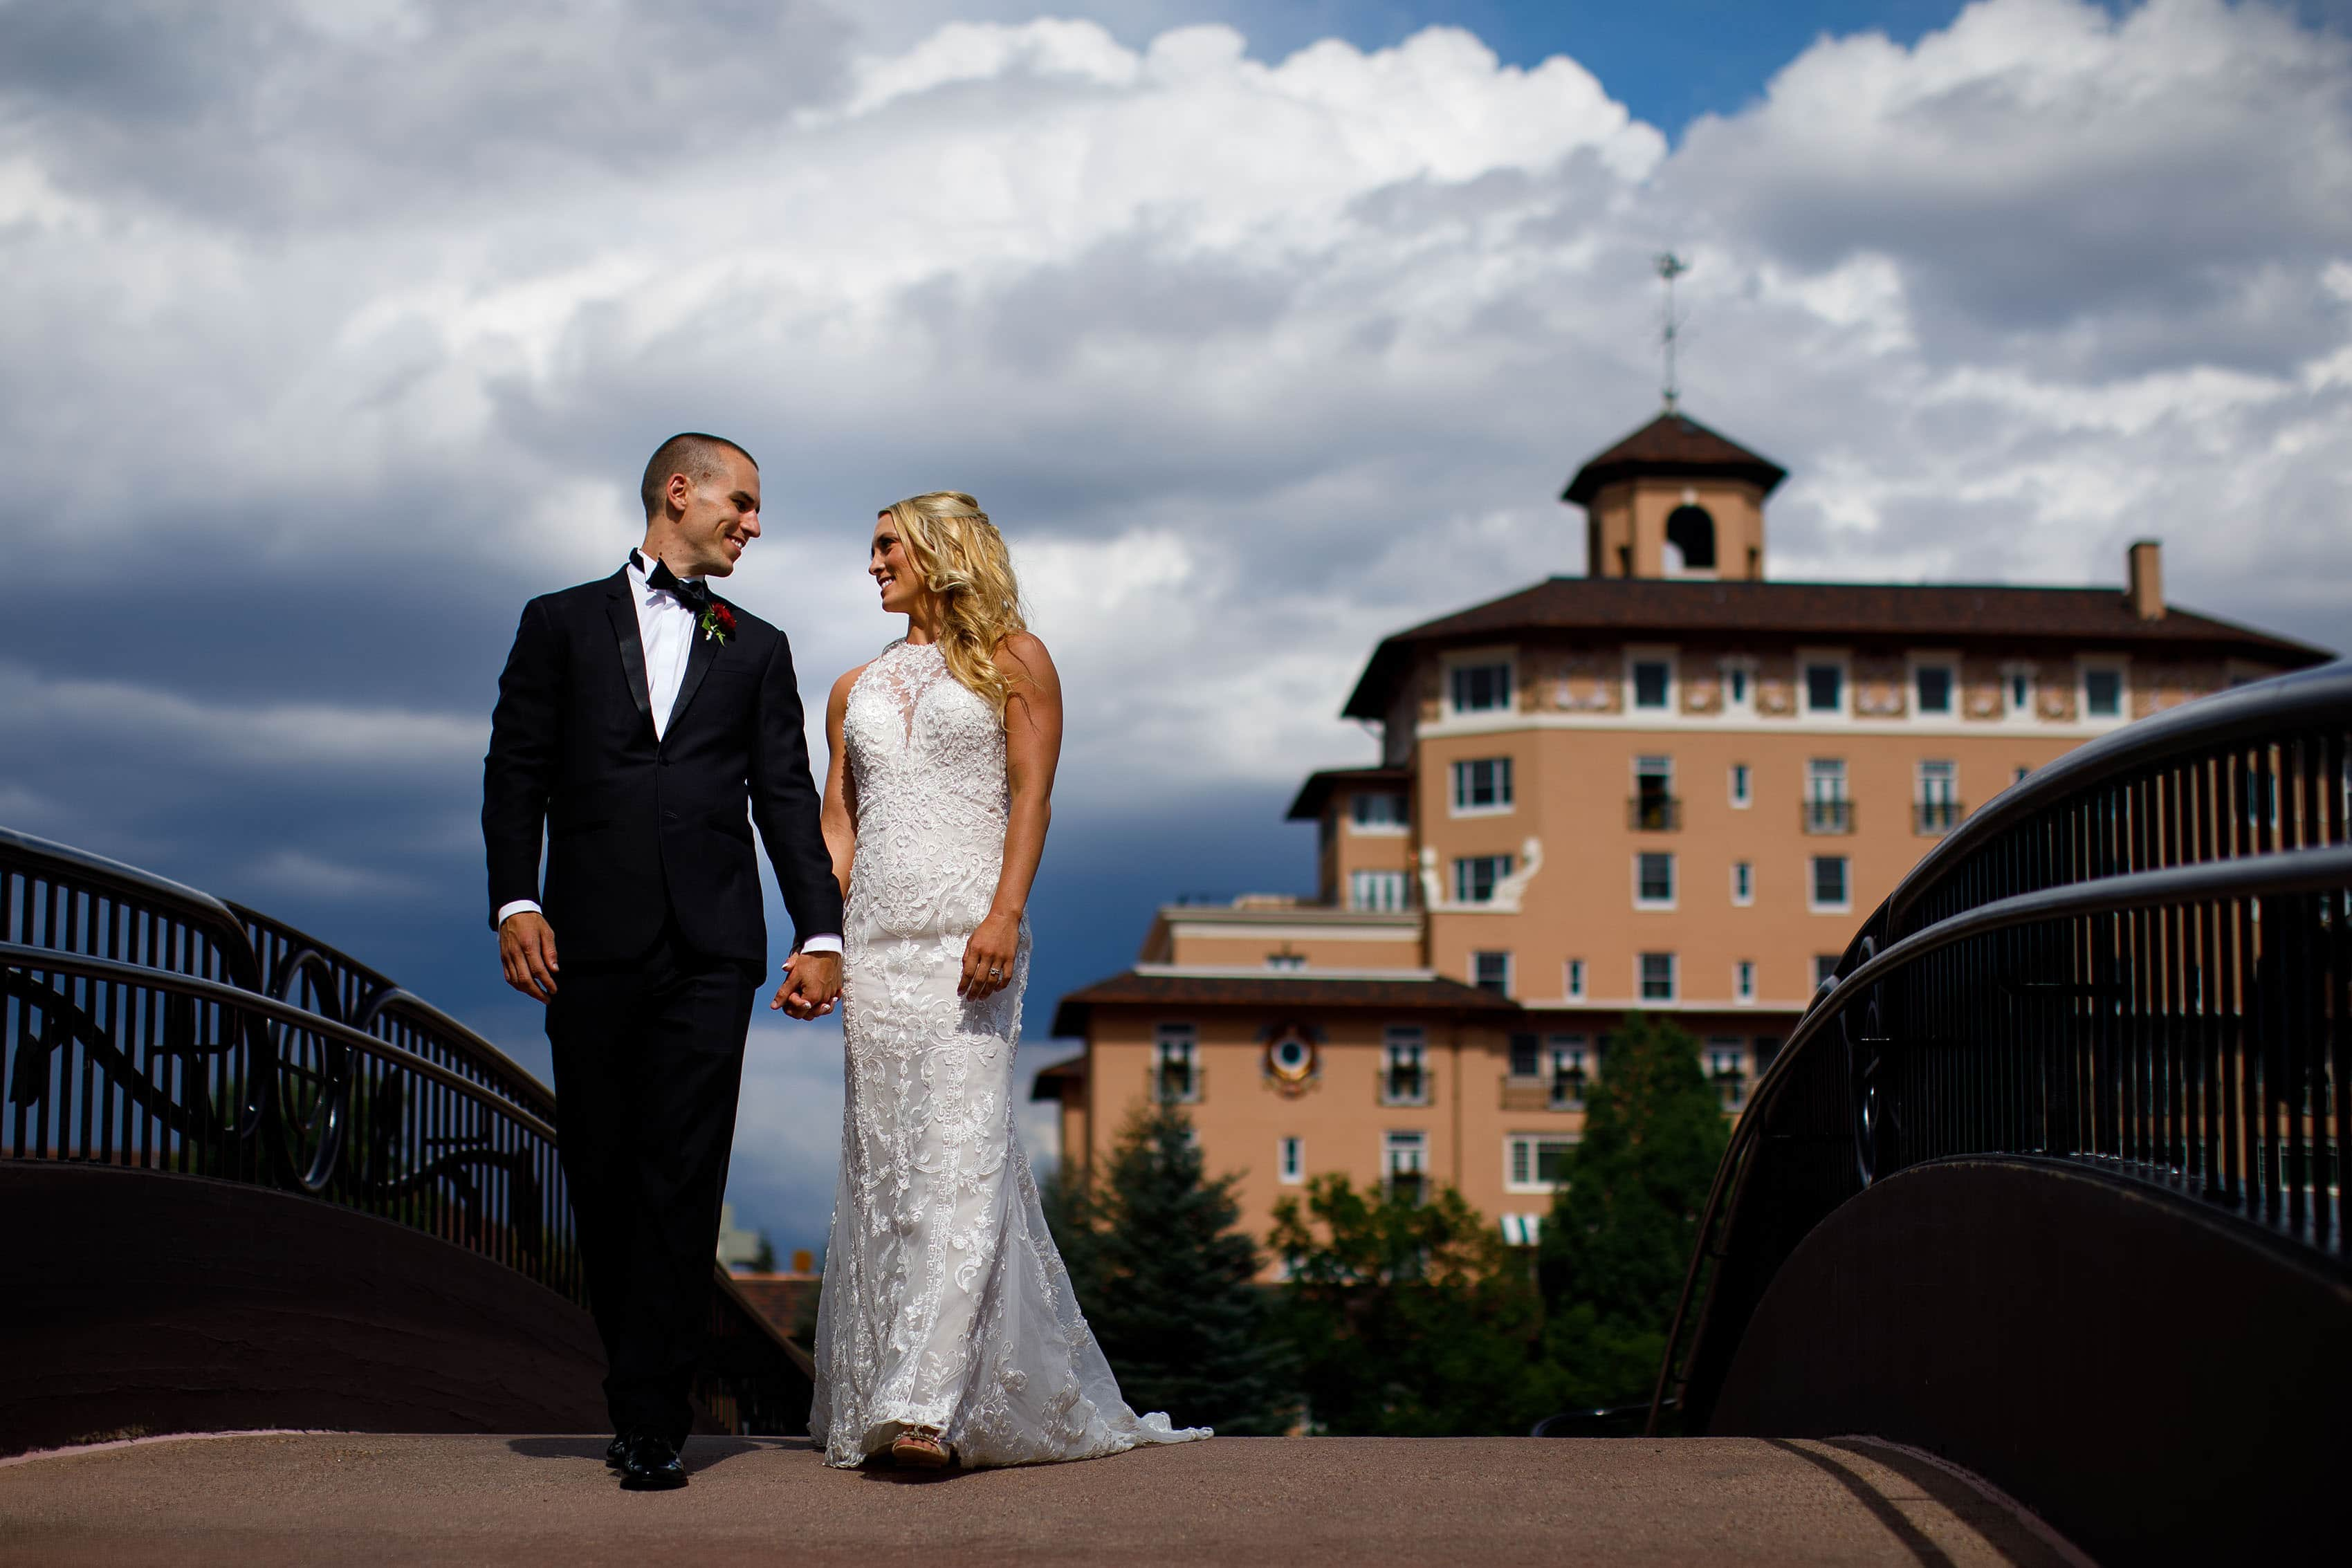 Kinsey and Sam walk together on the bridge at The Broadmoor near Cheyenne Lake